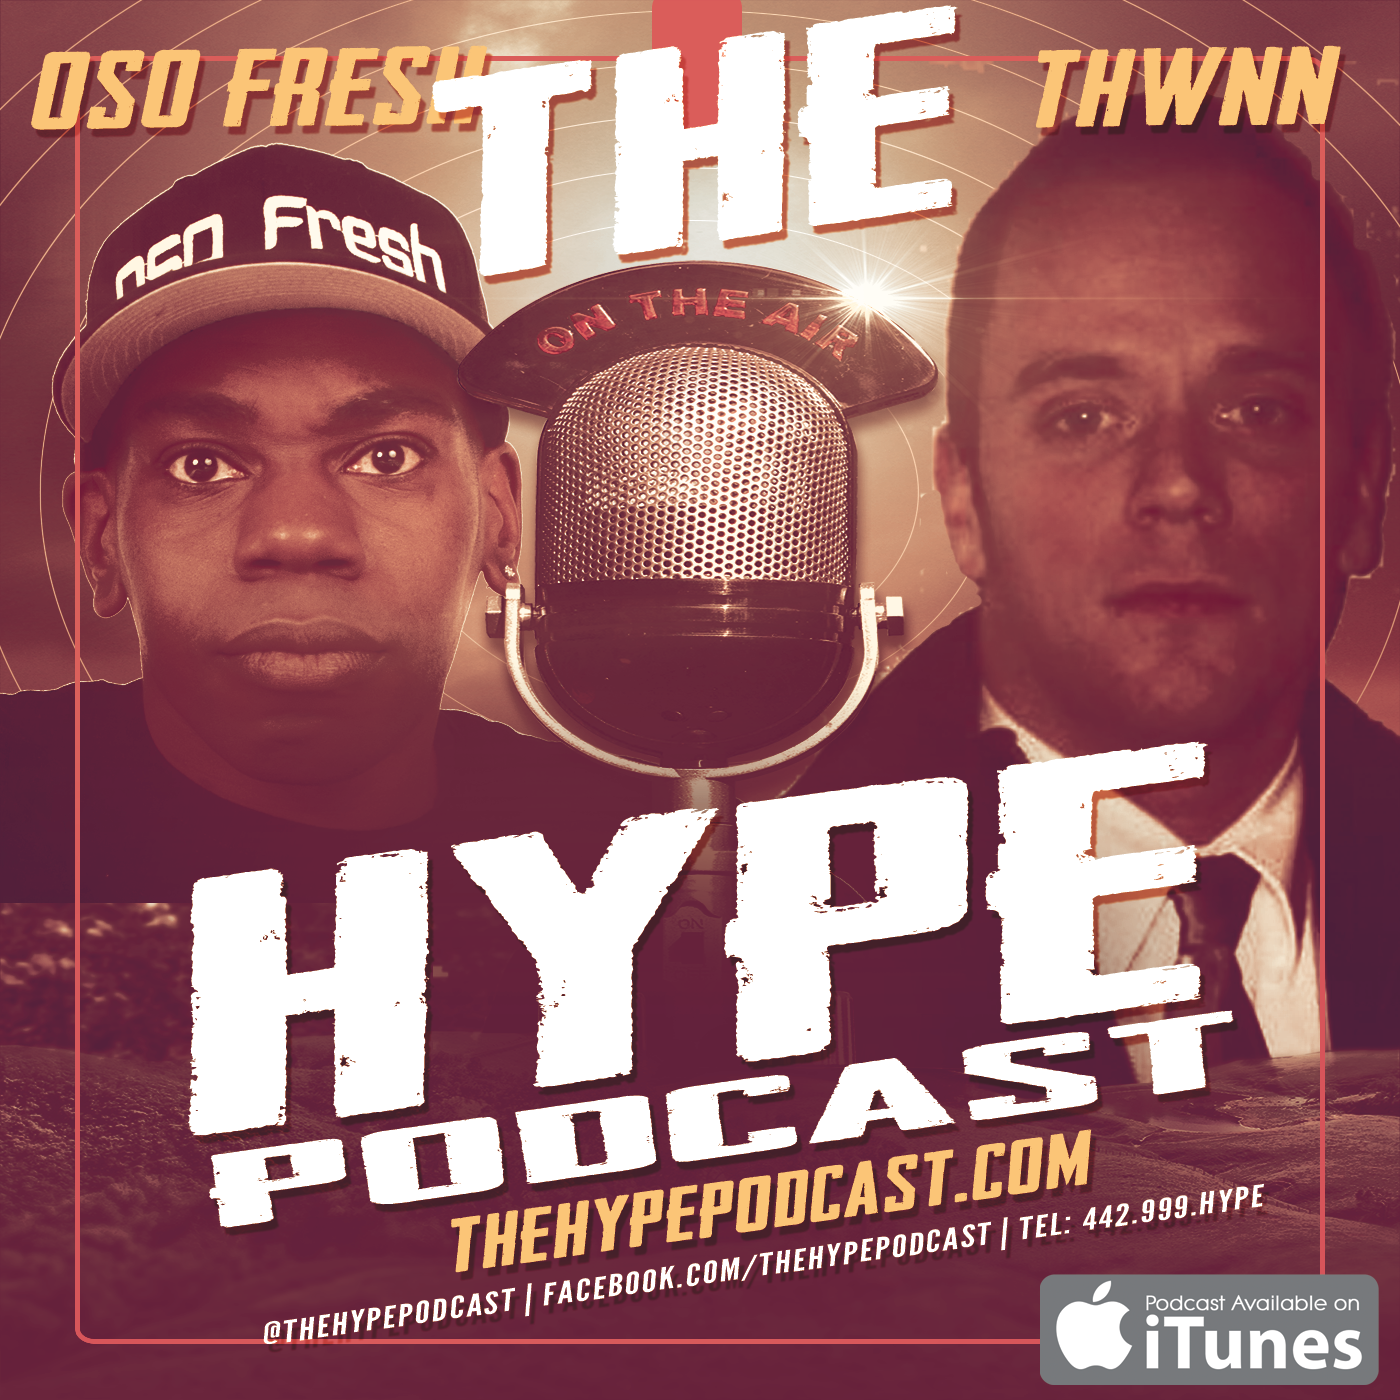 Artwork for The Hype Podcast episode 129 Deep fried Facebook